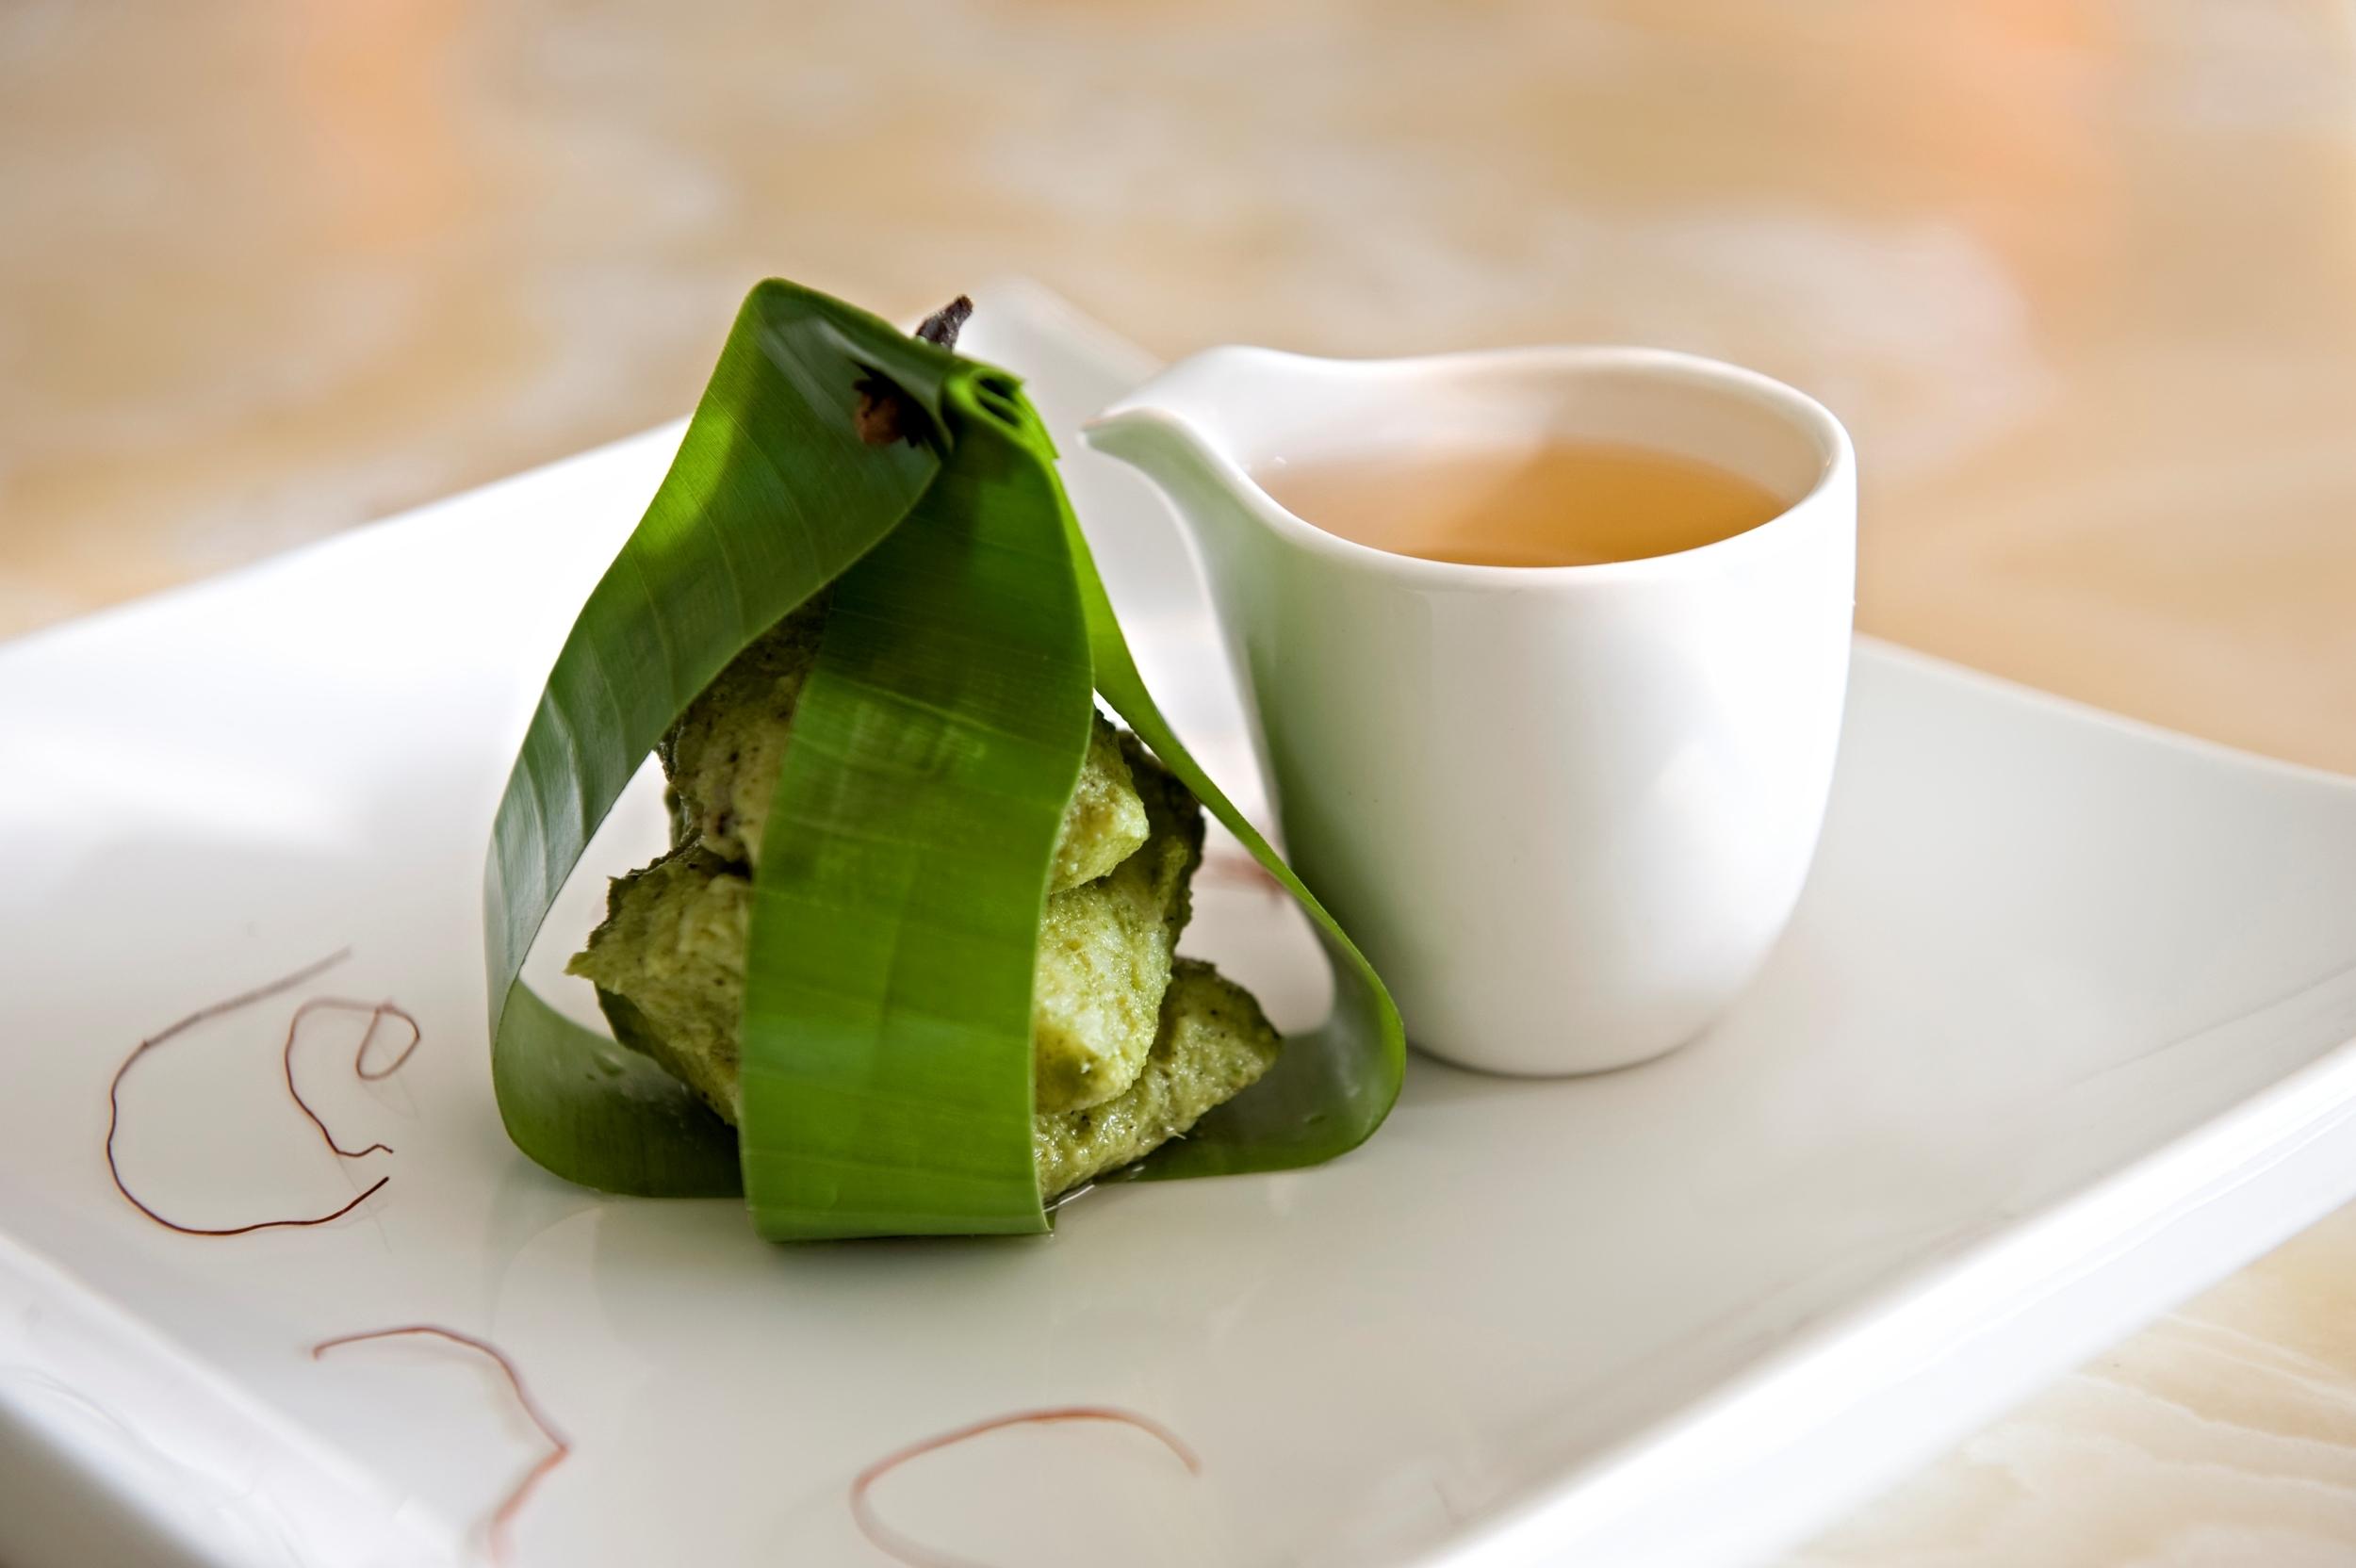 Galangal Infused Patrani Mekong Basa, Tomato Shorba Essence